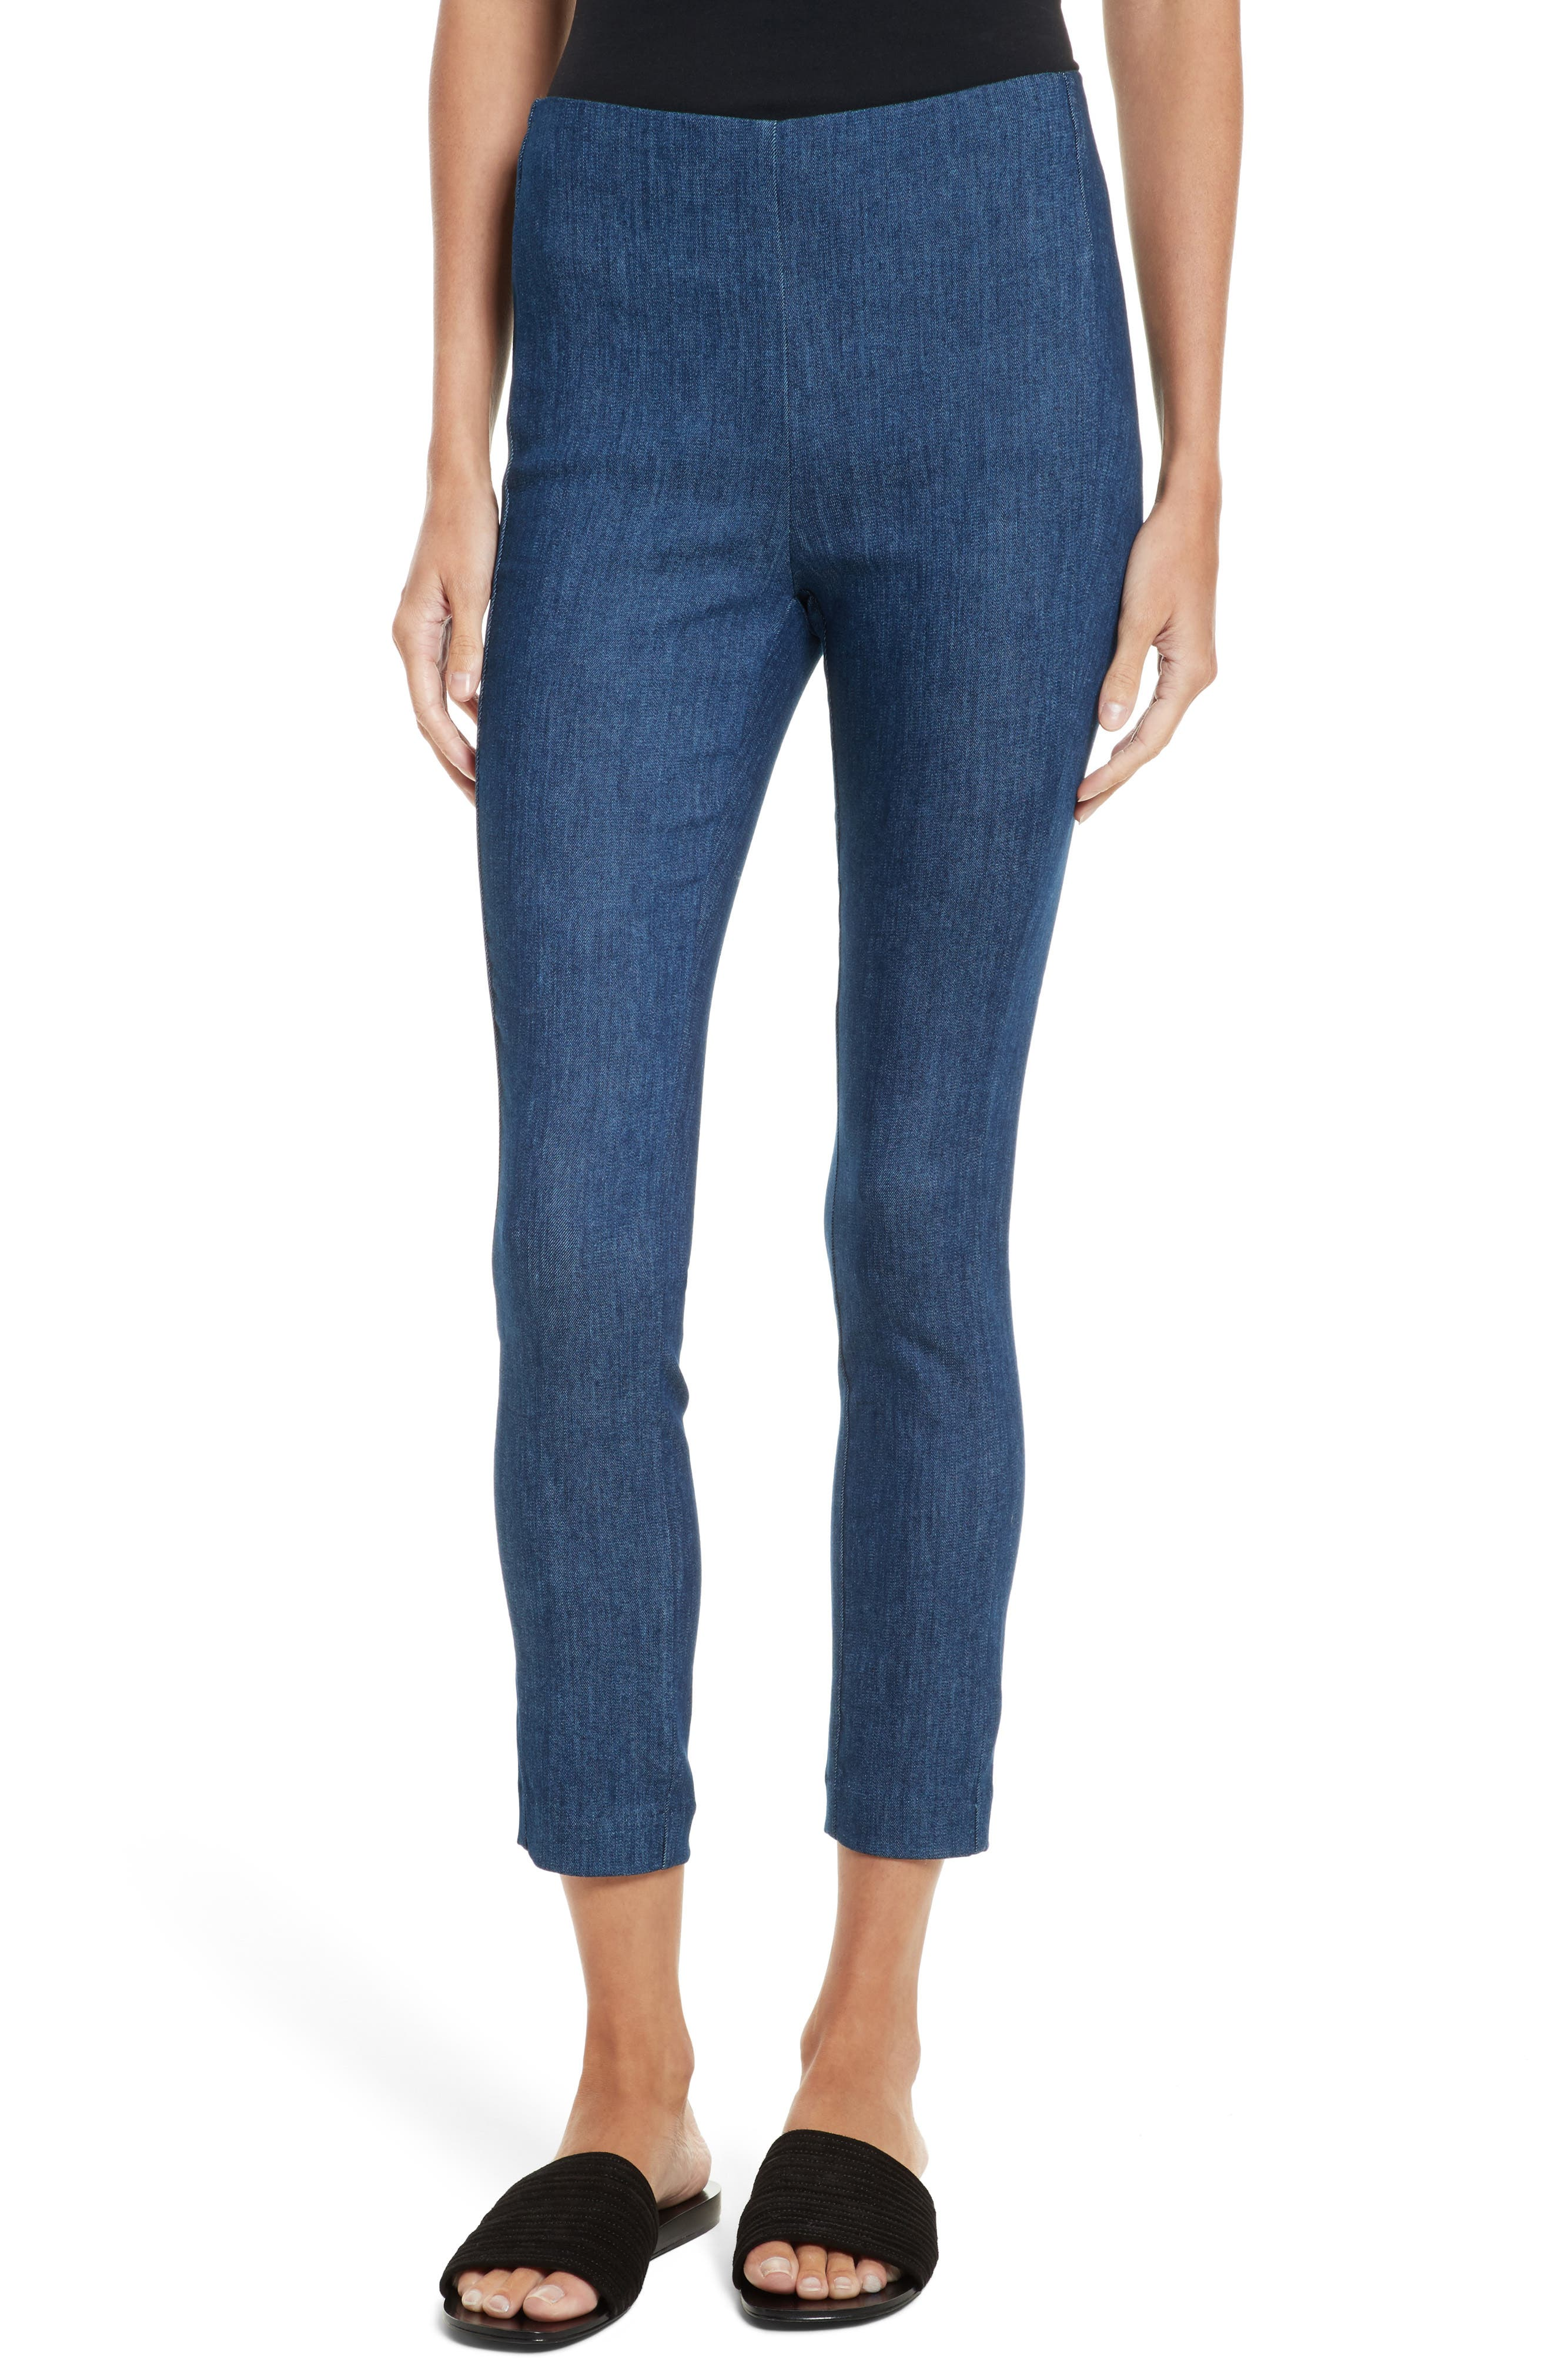 Alternate Image 1 Selected - rag & bone Simone Slim Ankle Pants